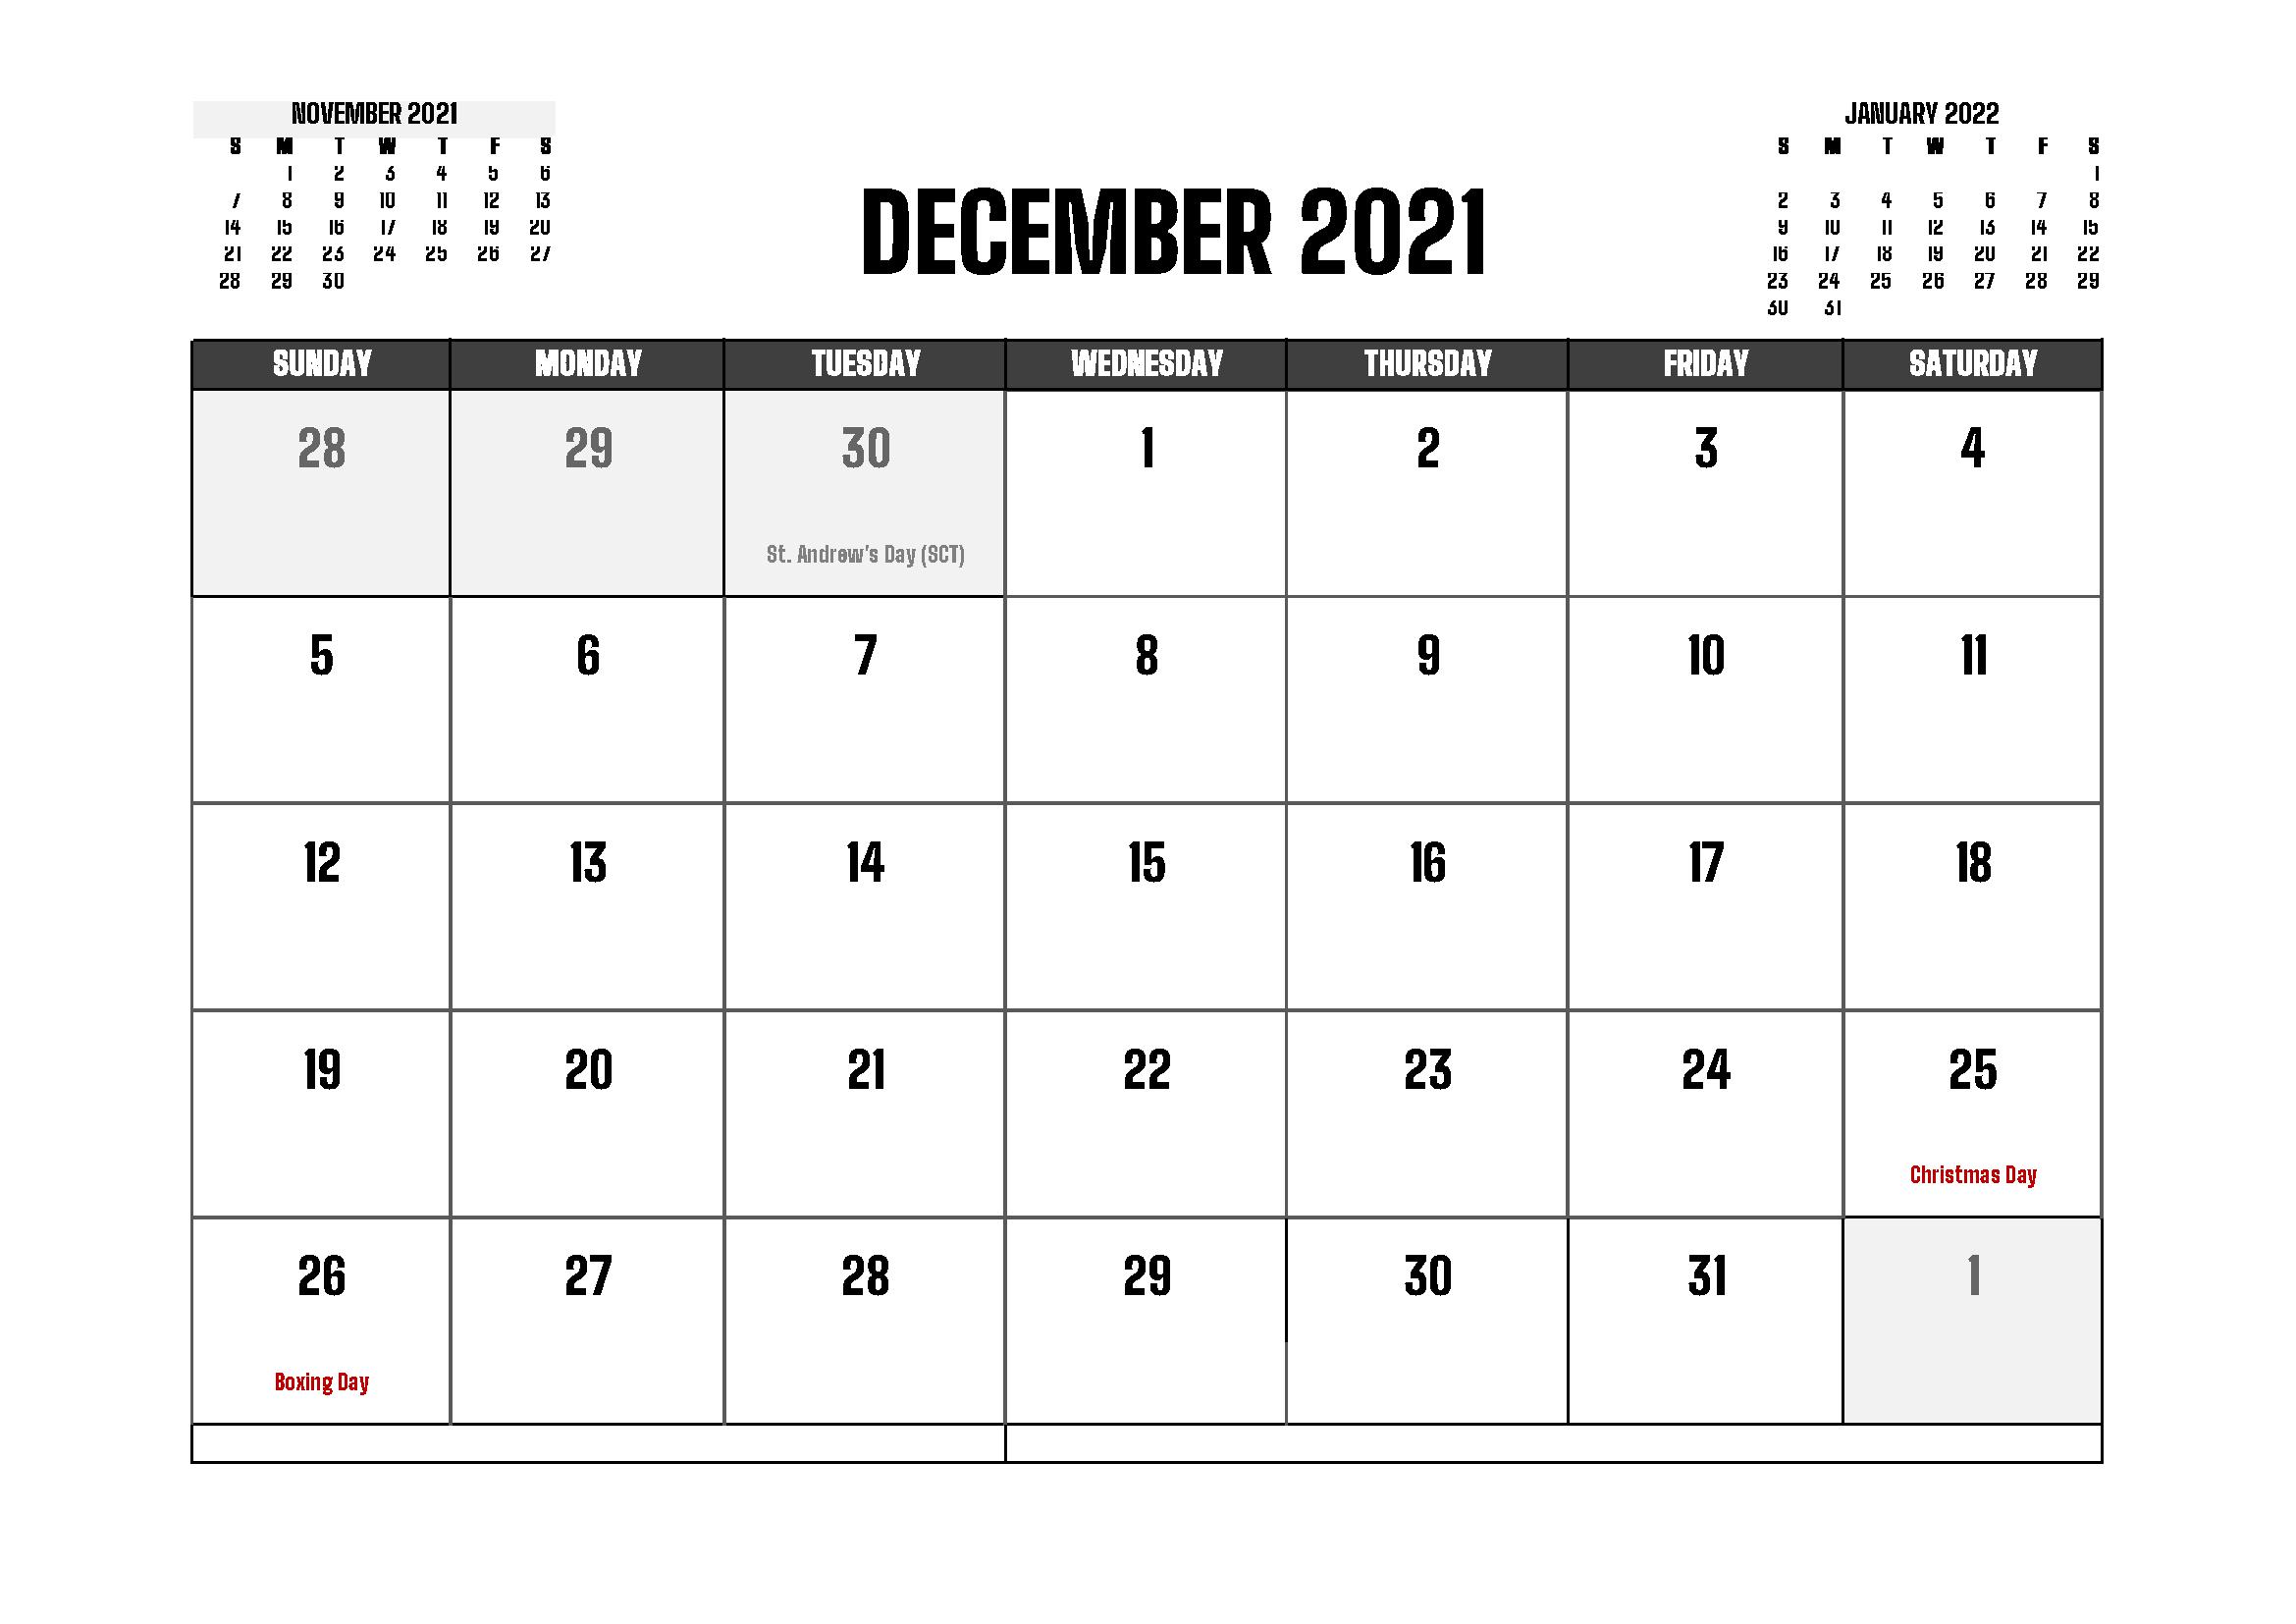 December 2021 Calendar Gujrati